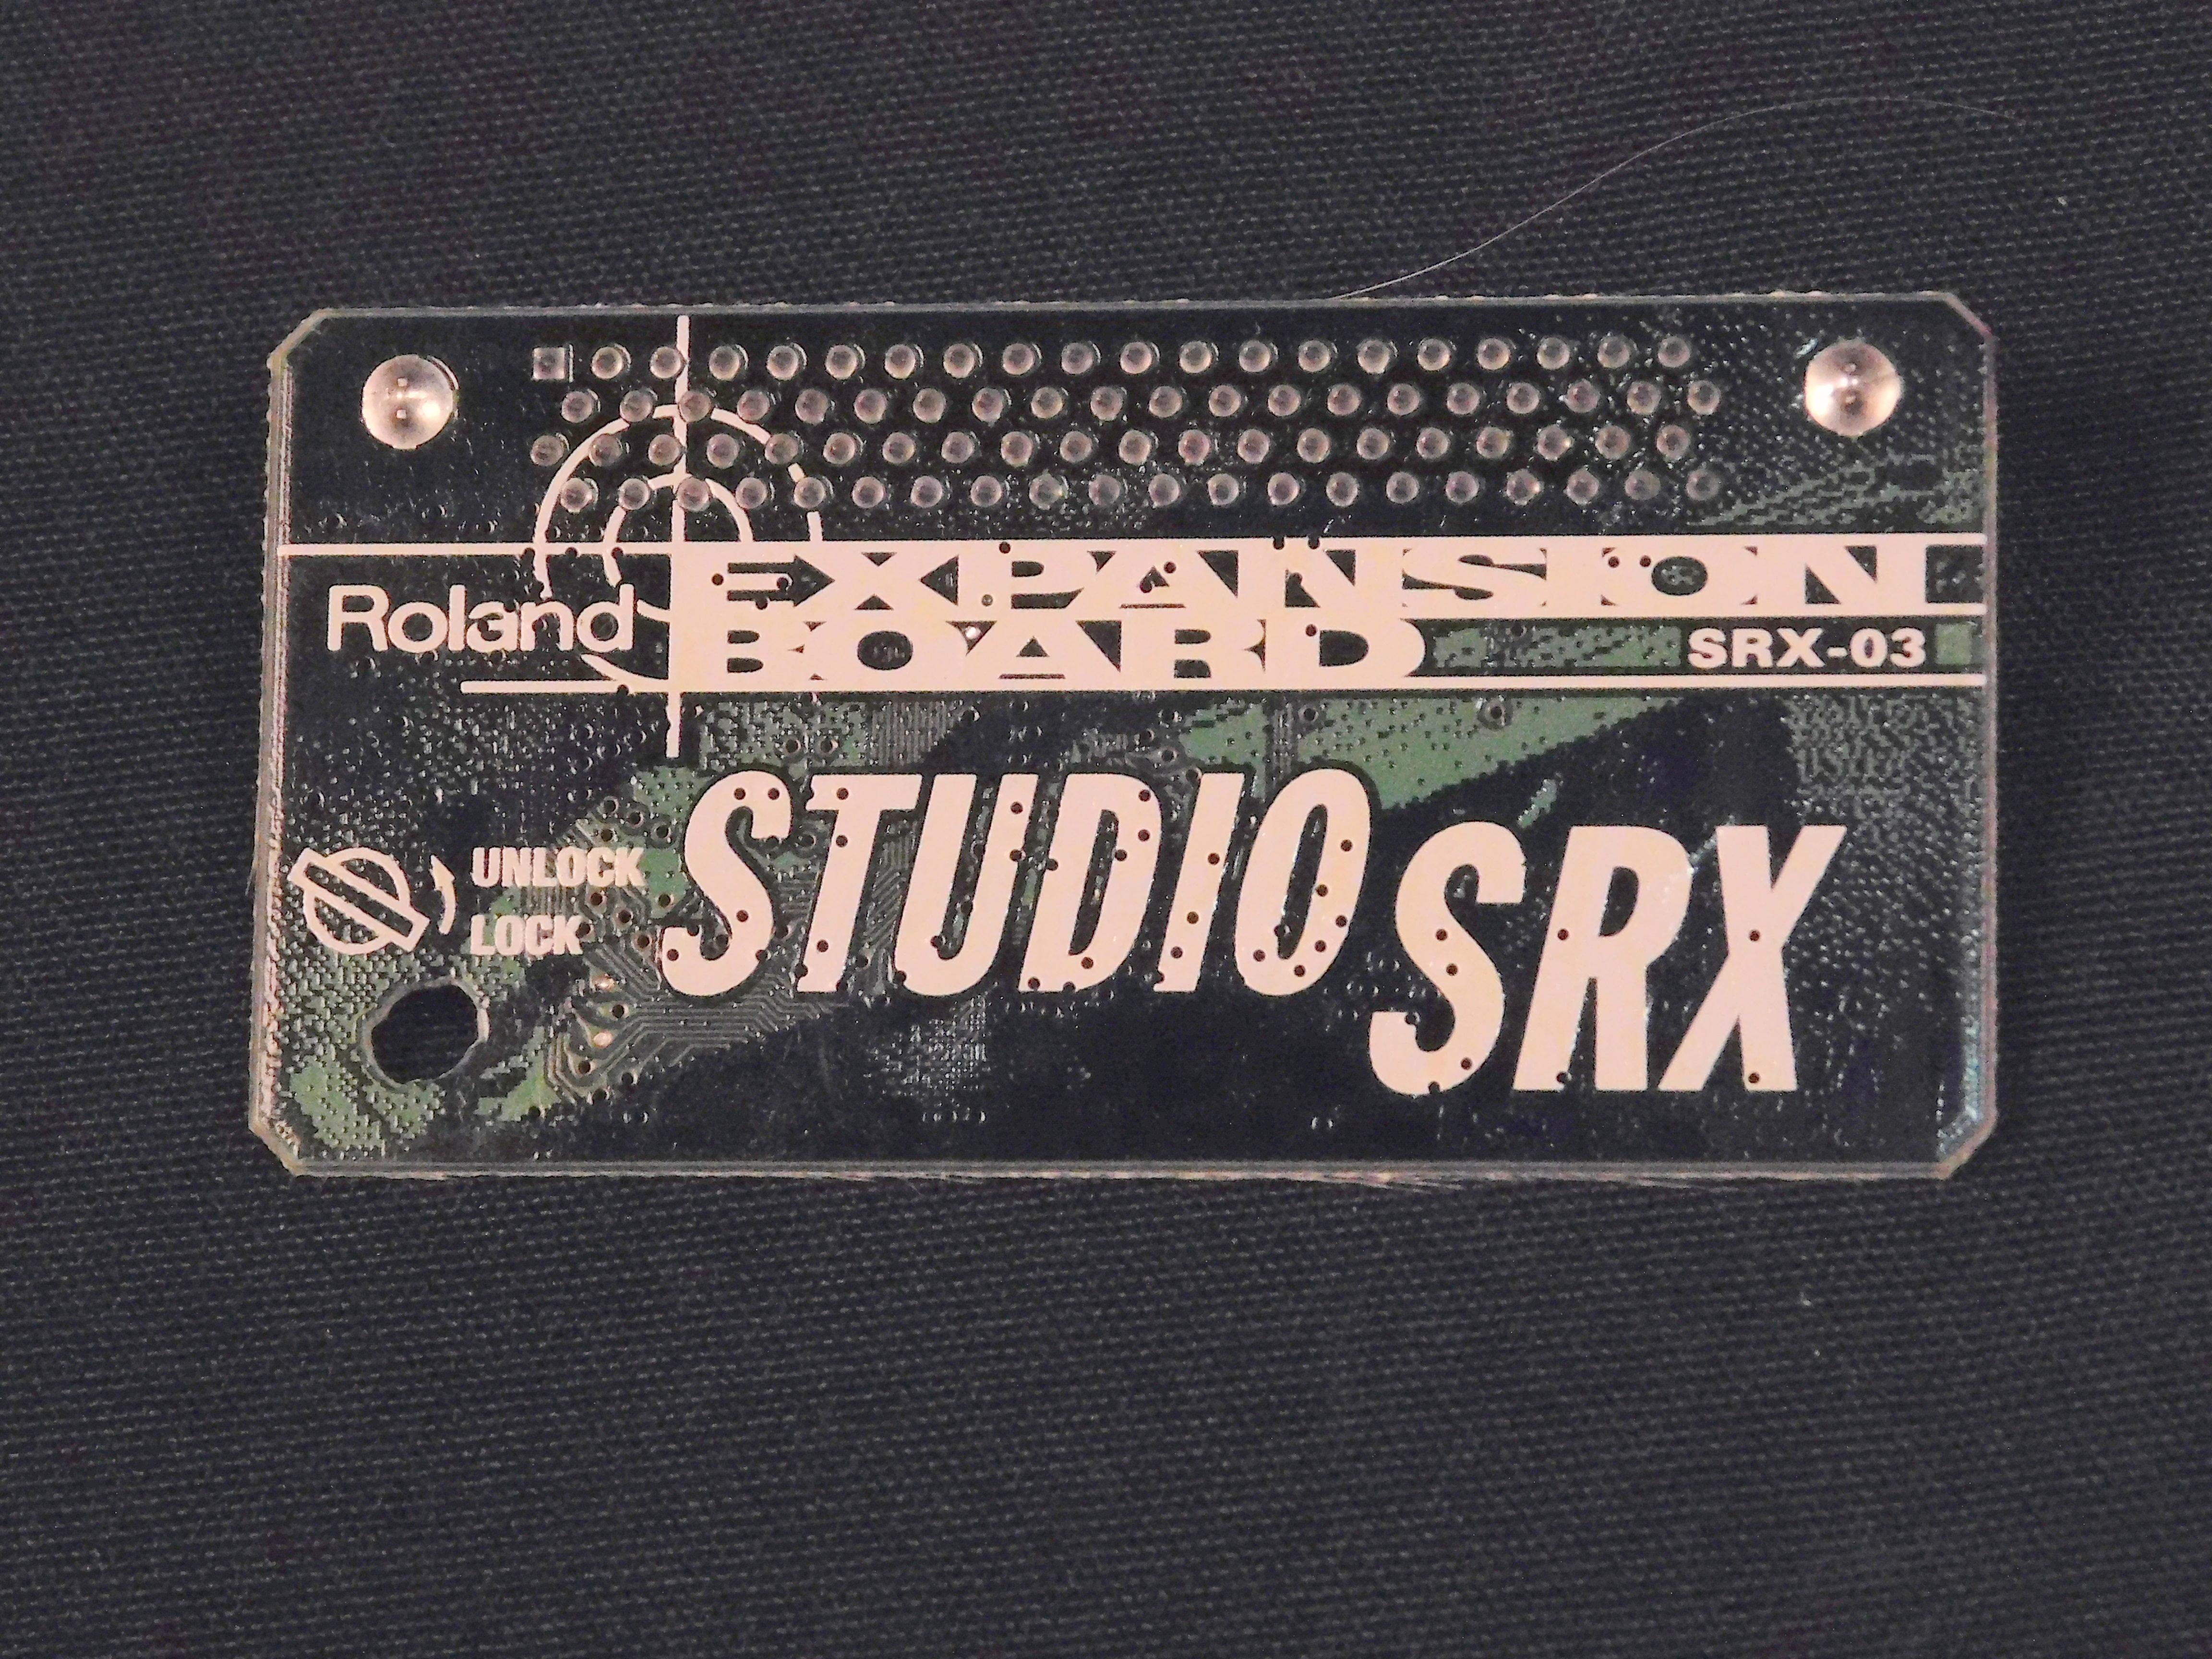 ROLAND SRX-03 STUDIO EXPANSION CARD